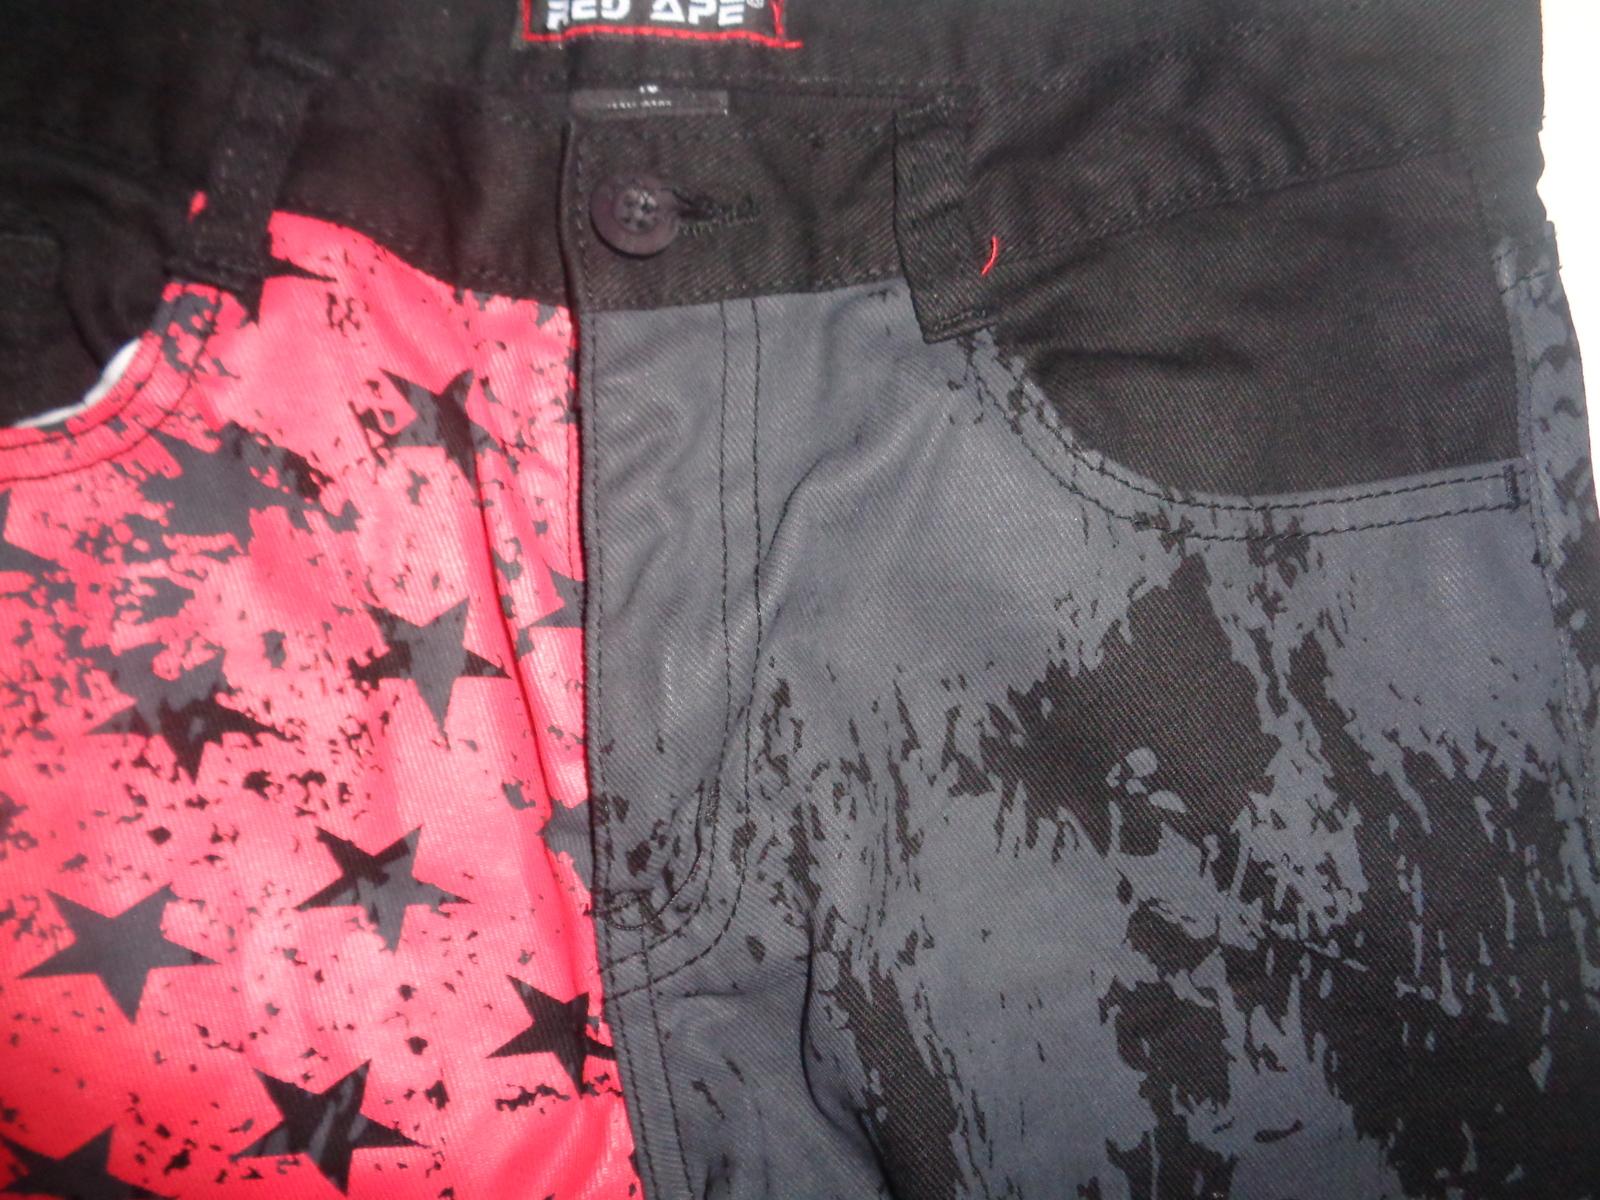 Boy's RED APE Jeans NWOT 28/27 Black Flag Stars